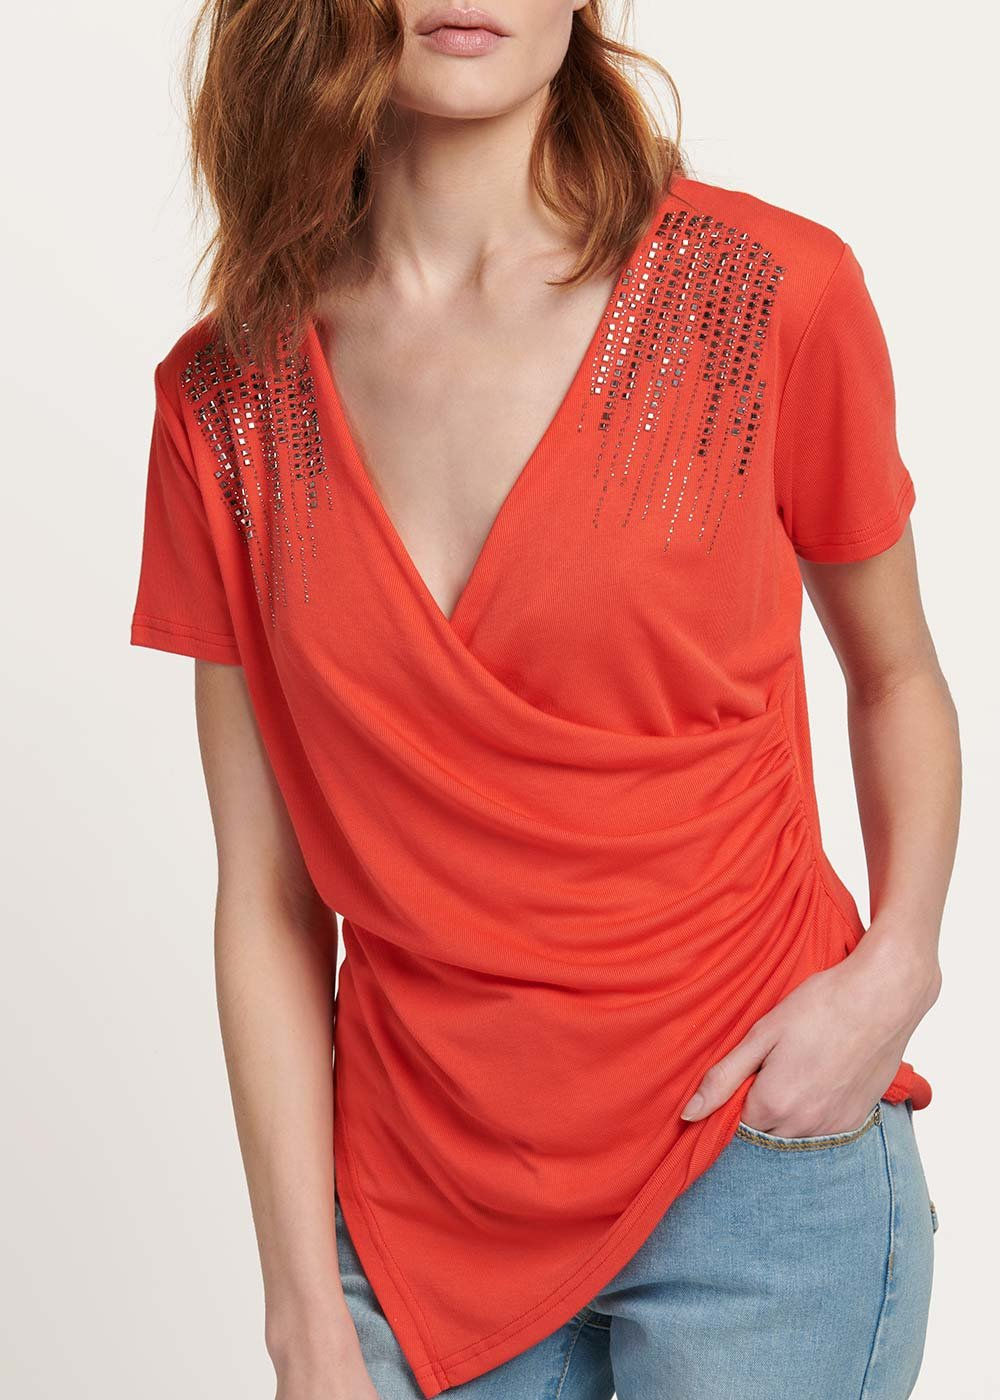 T-shirt Serena con dettagli cristalli - Aragosta - Donna